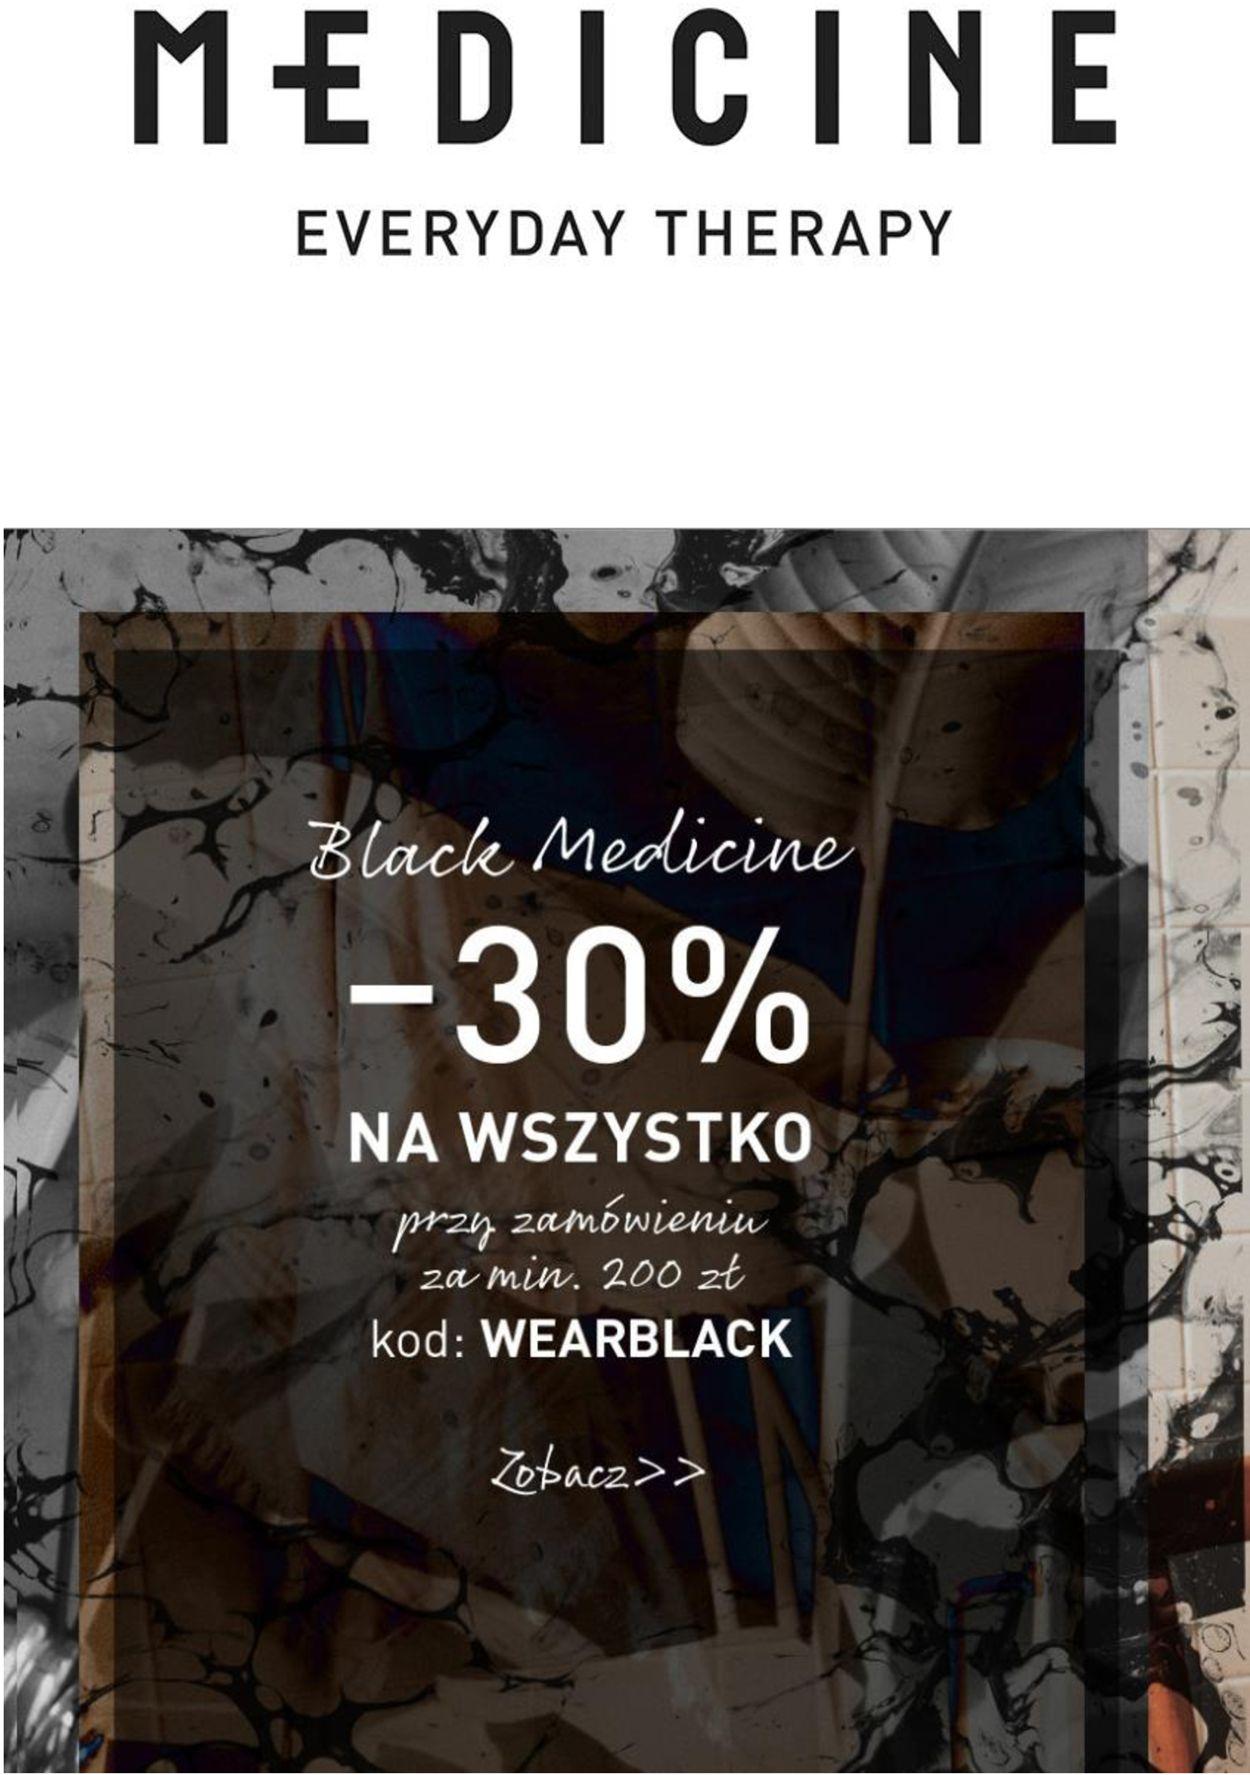 Gazetka promocyjna Medicine Black Friday 2020 - 26.11-02.12.2020